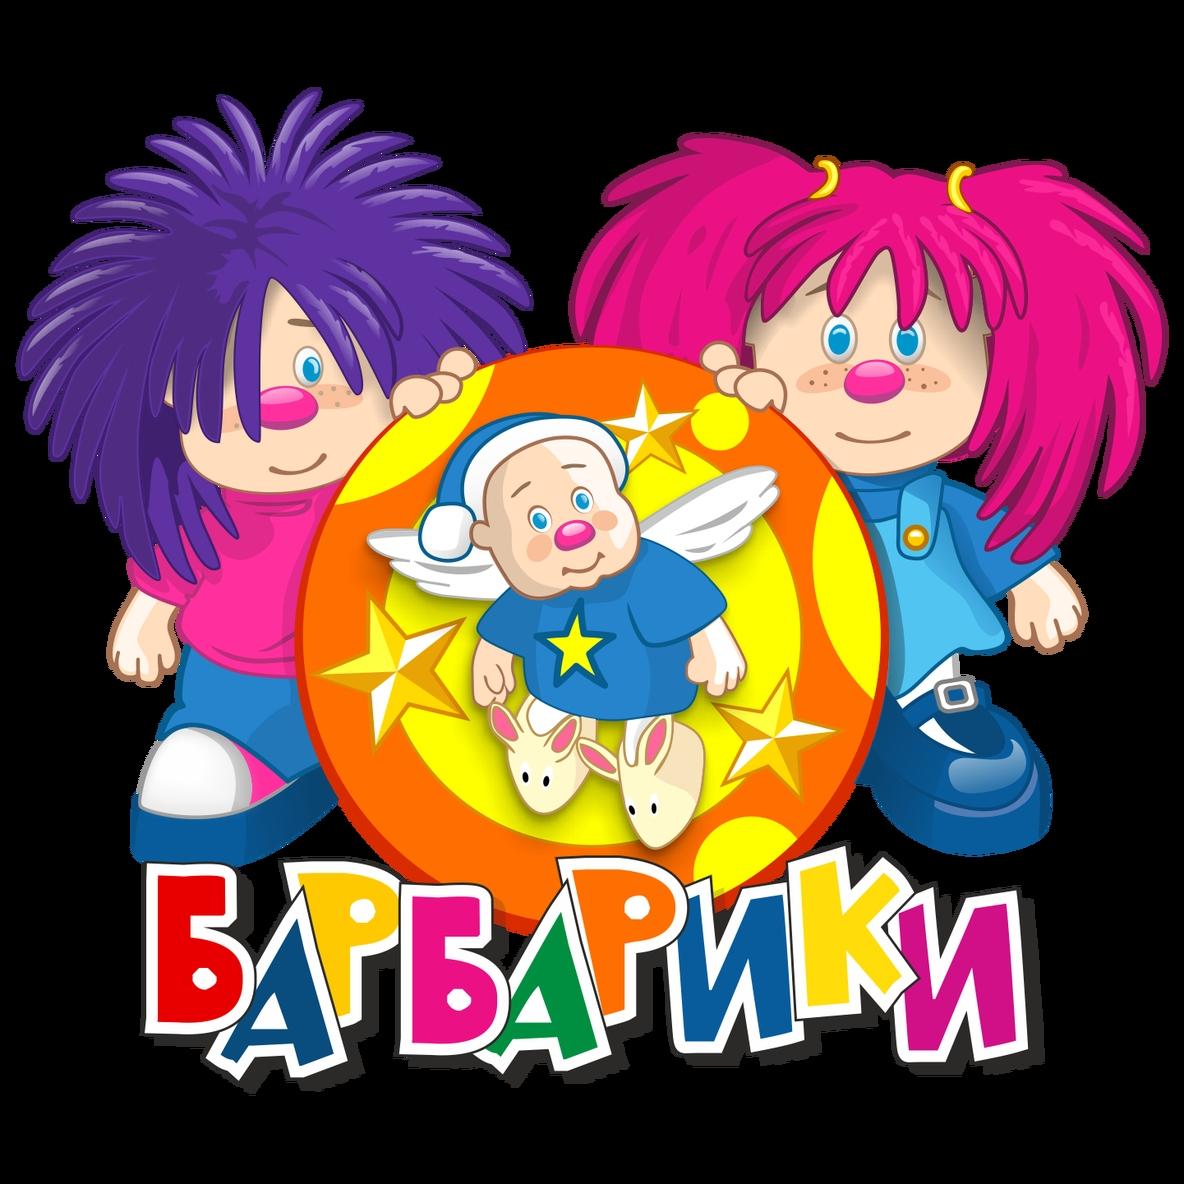 Жиробасинки - С днем Рождения,Нелли Борисовна